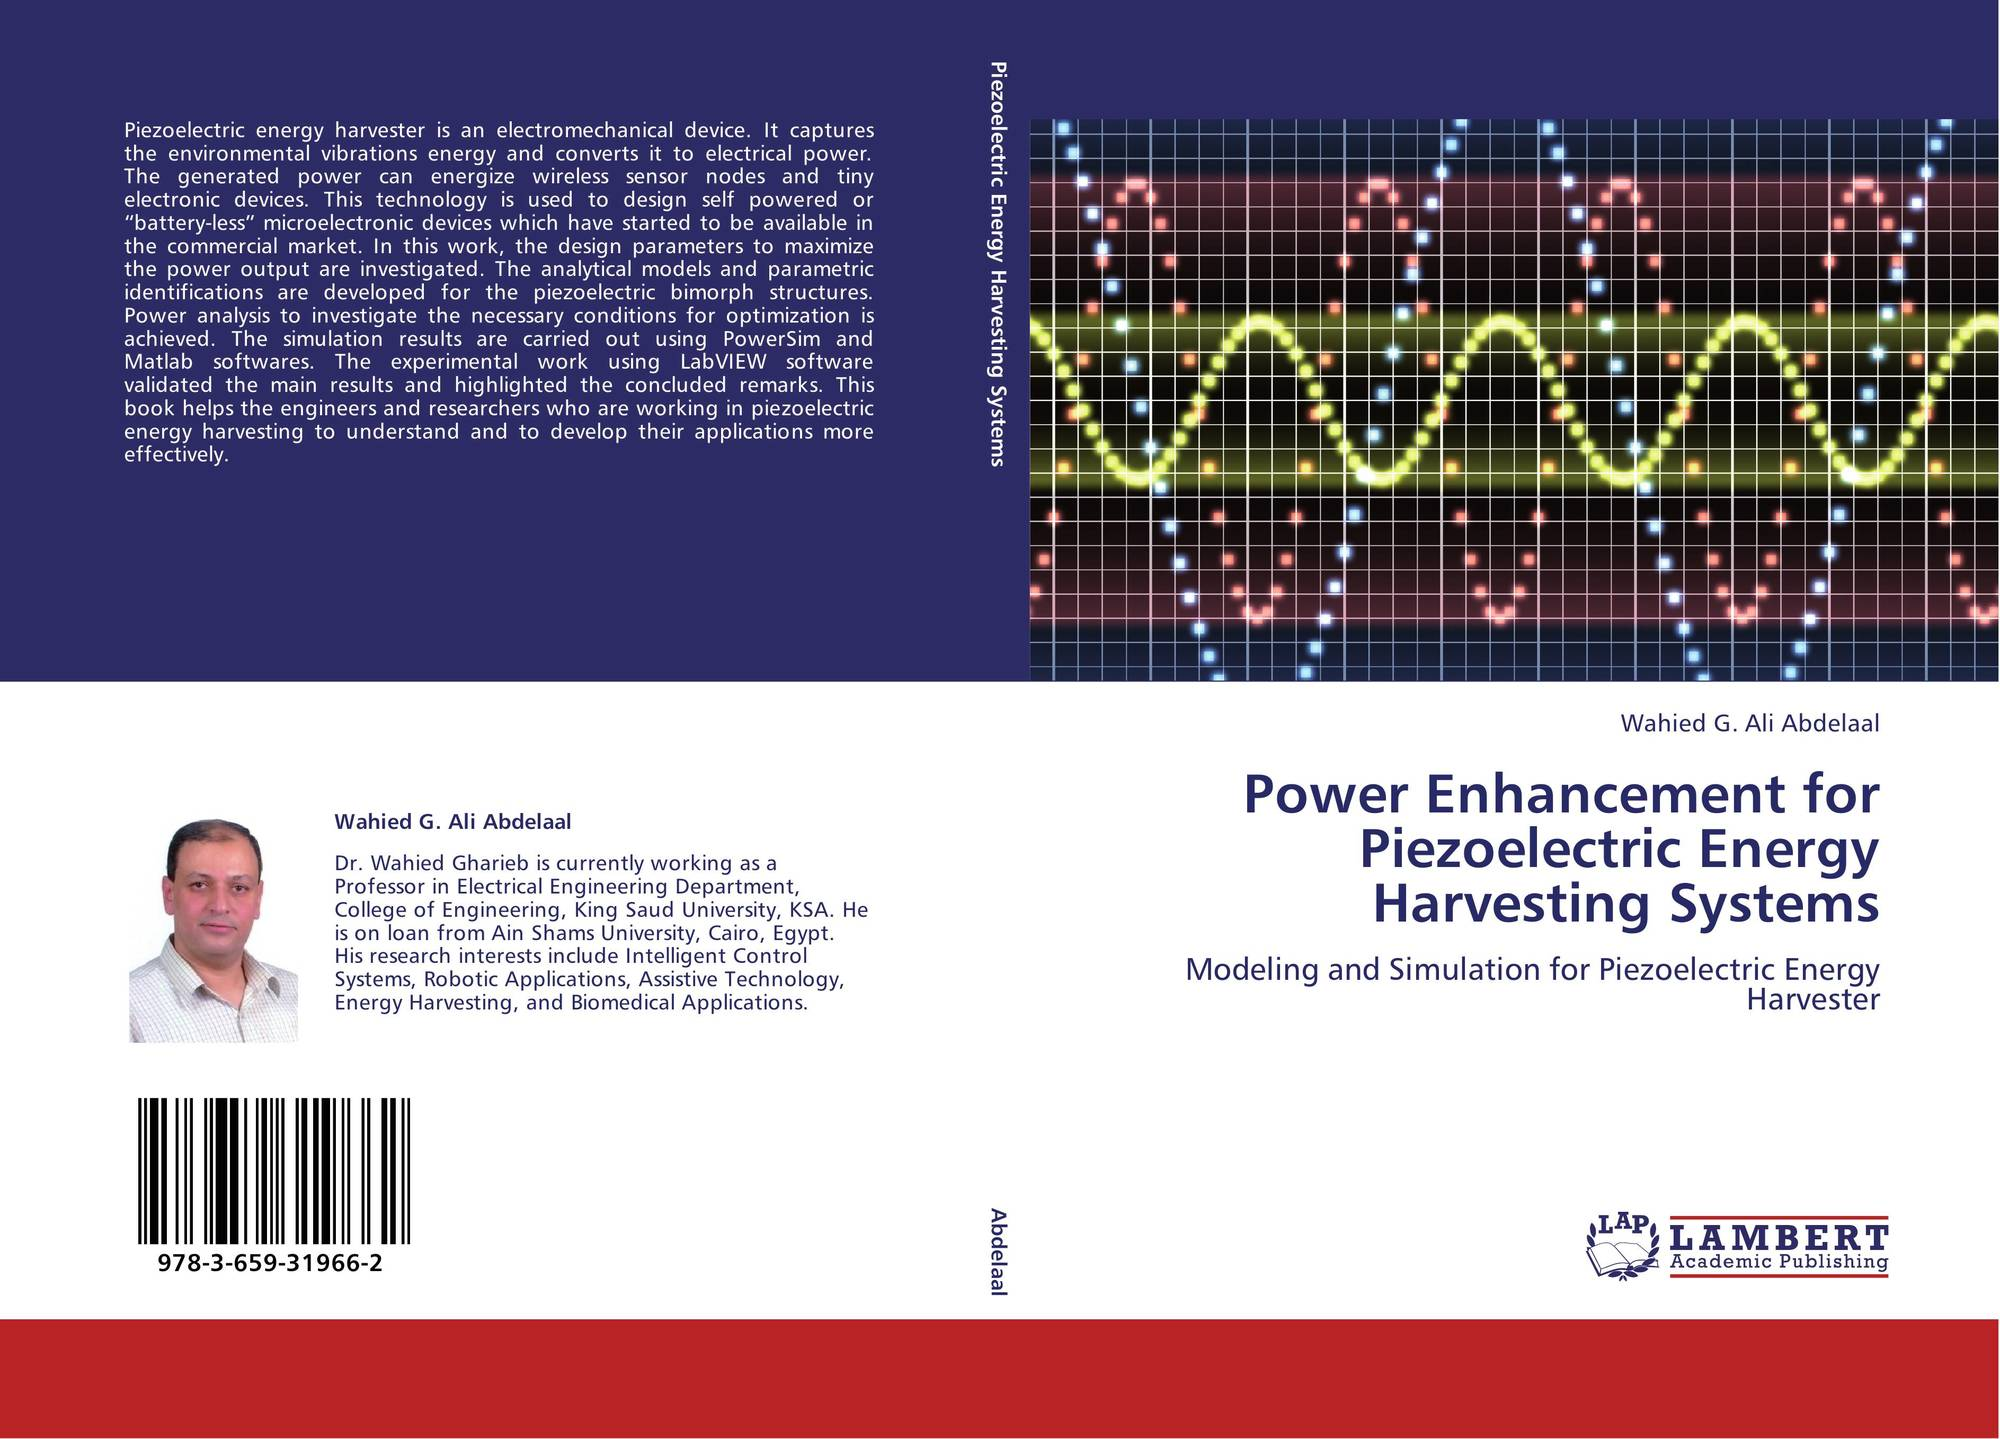 Power Enhancement for Piezoelectric Energy Harvesting